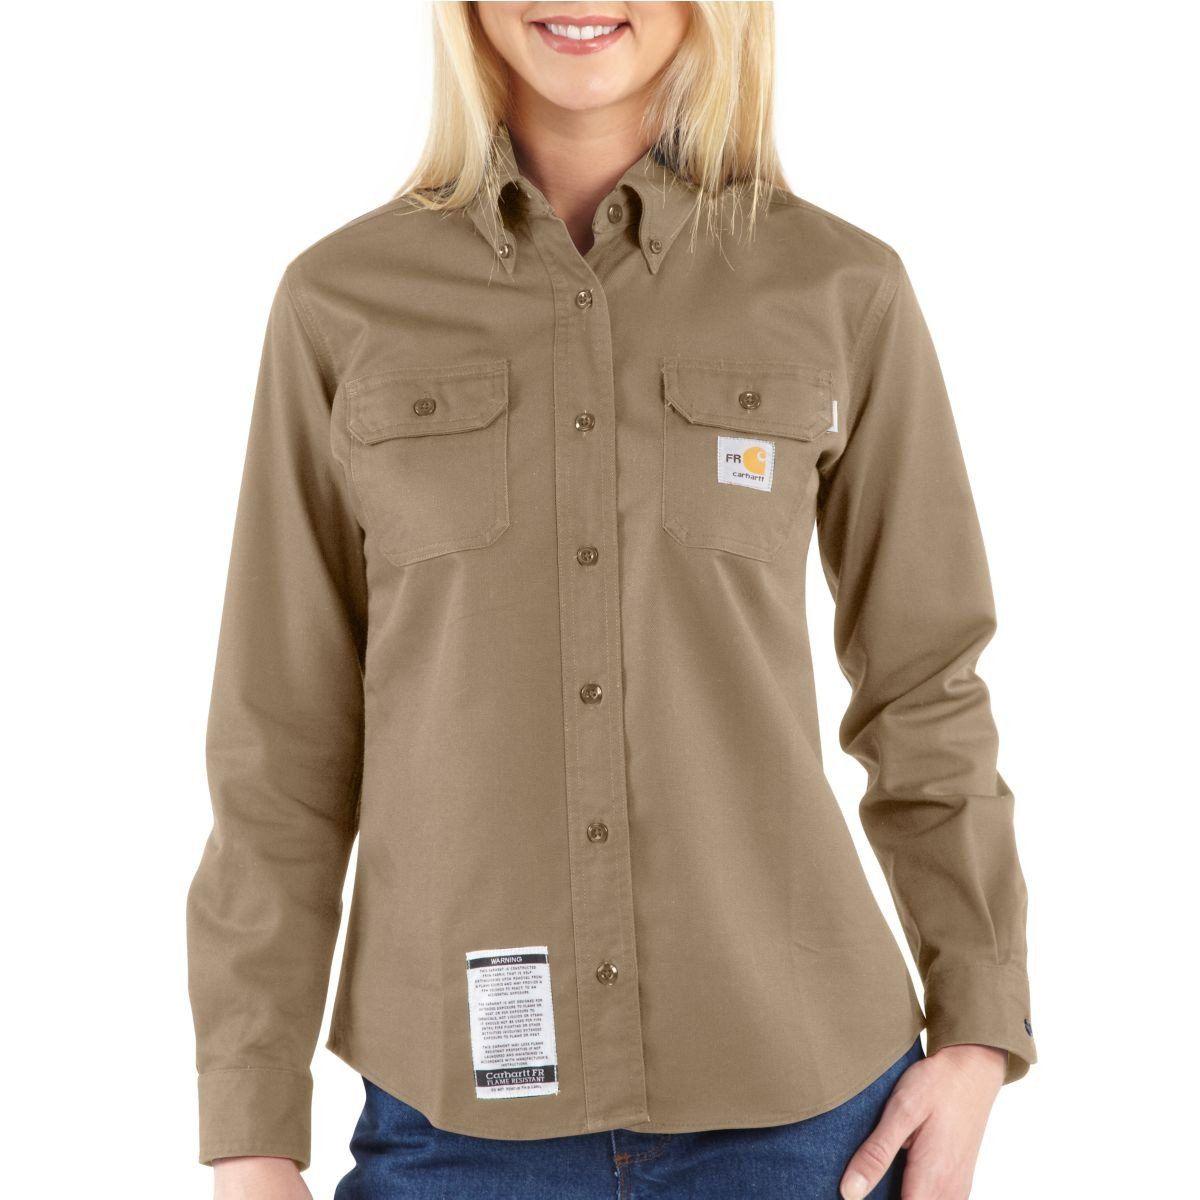 Bulwark X-Large Khaki Cotton Nylon Flame Resistant Shirt With Button Closure